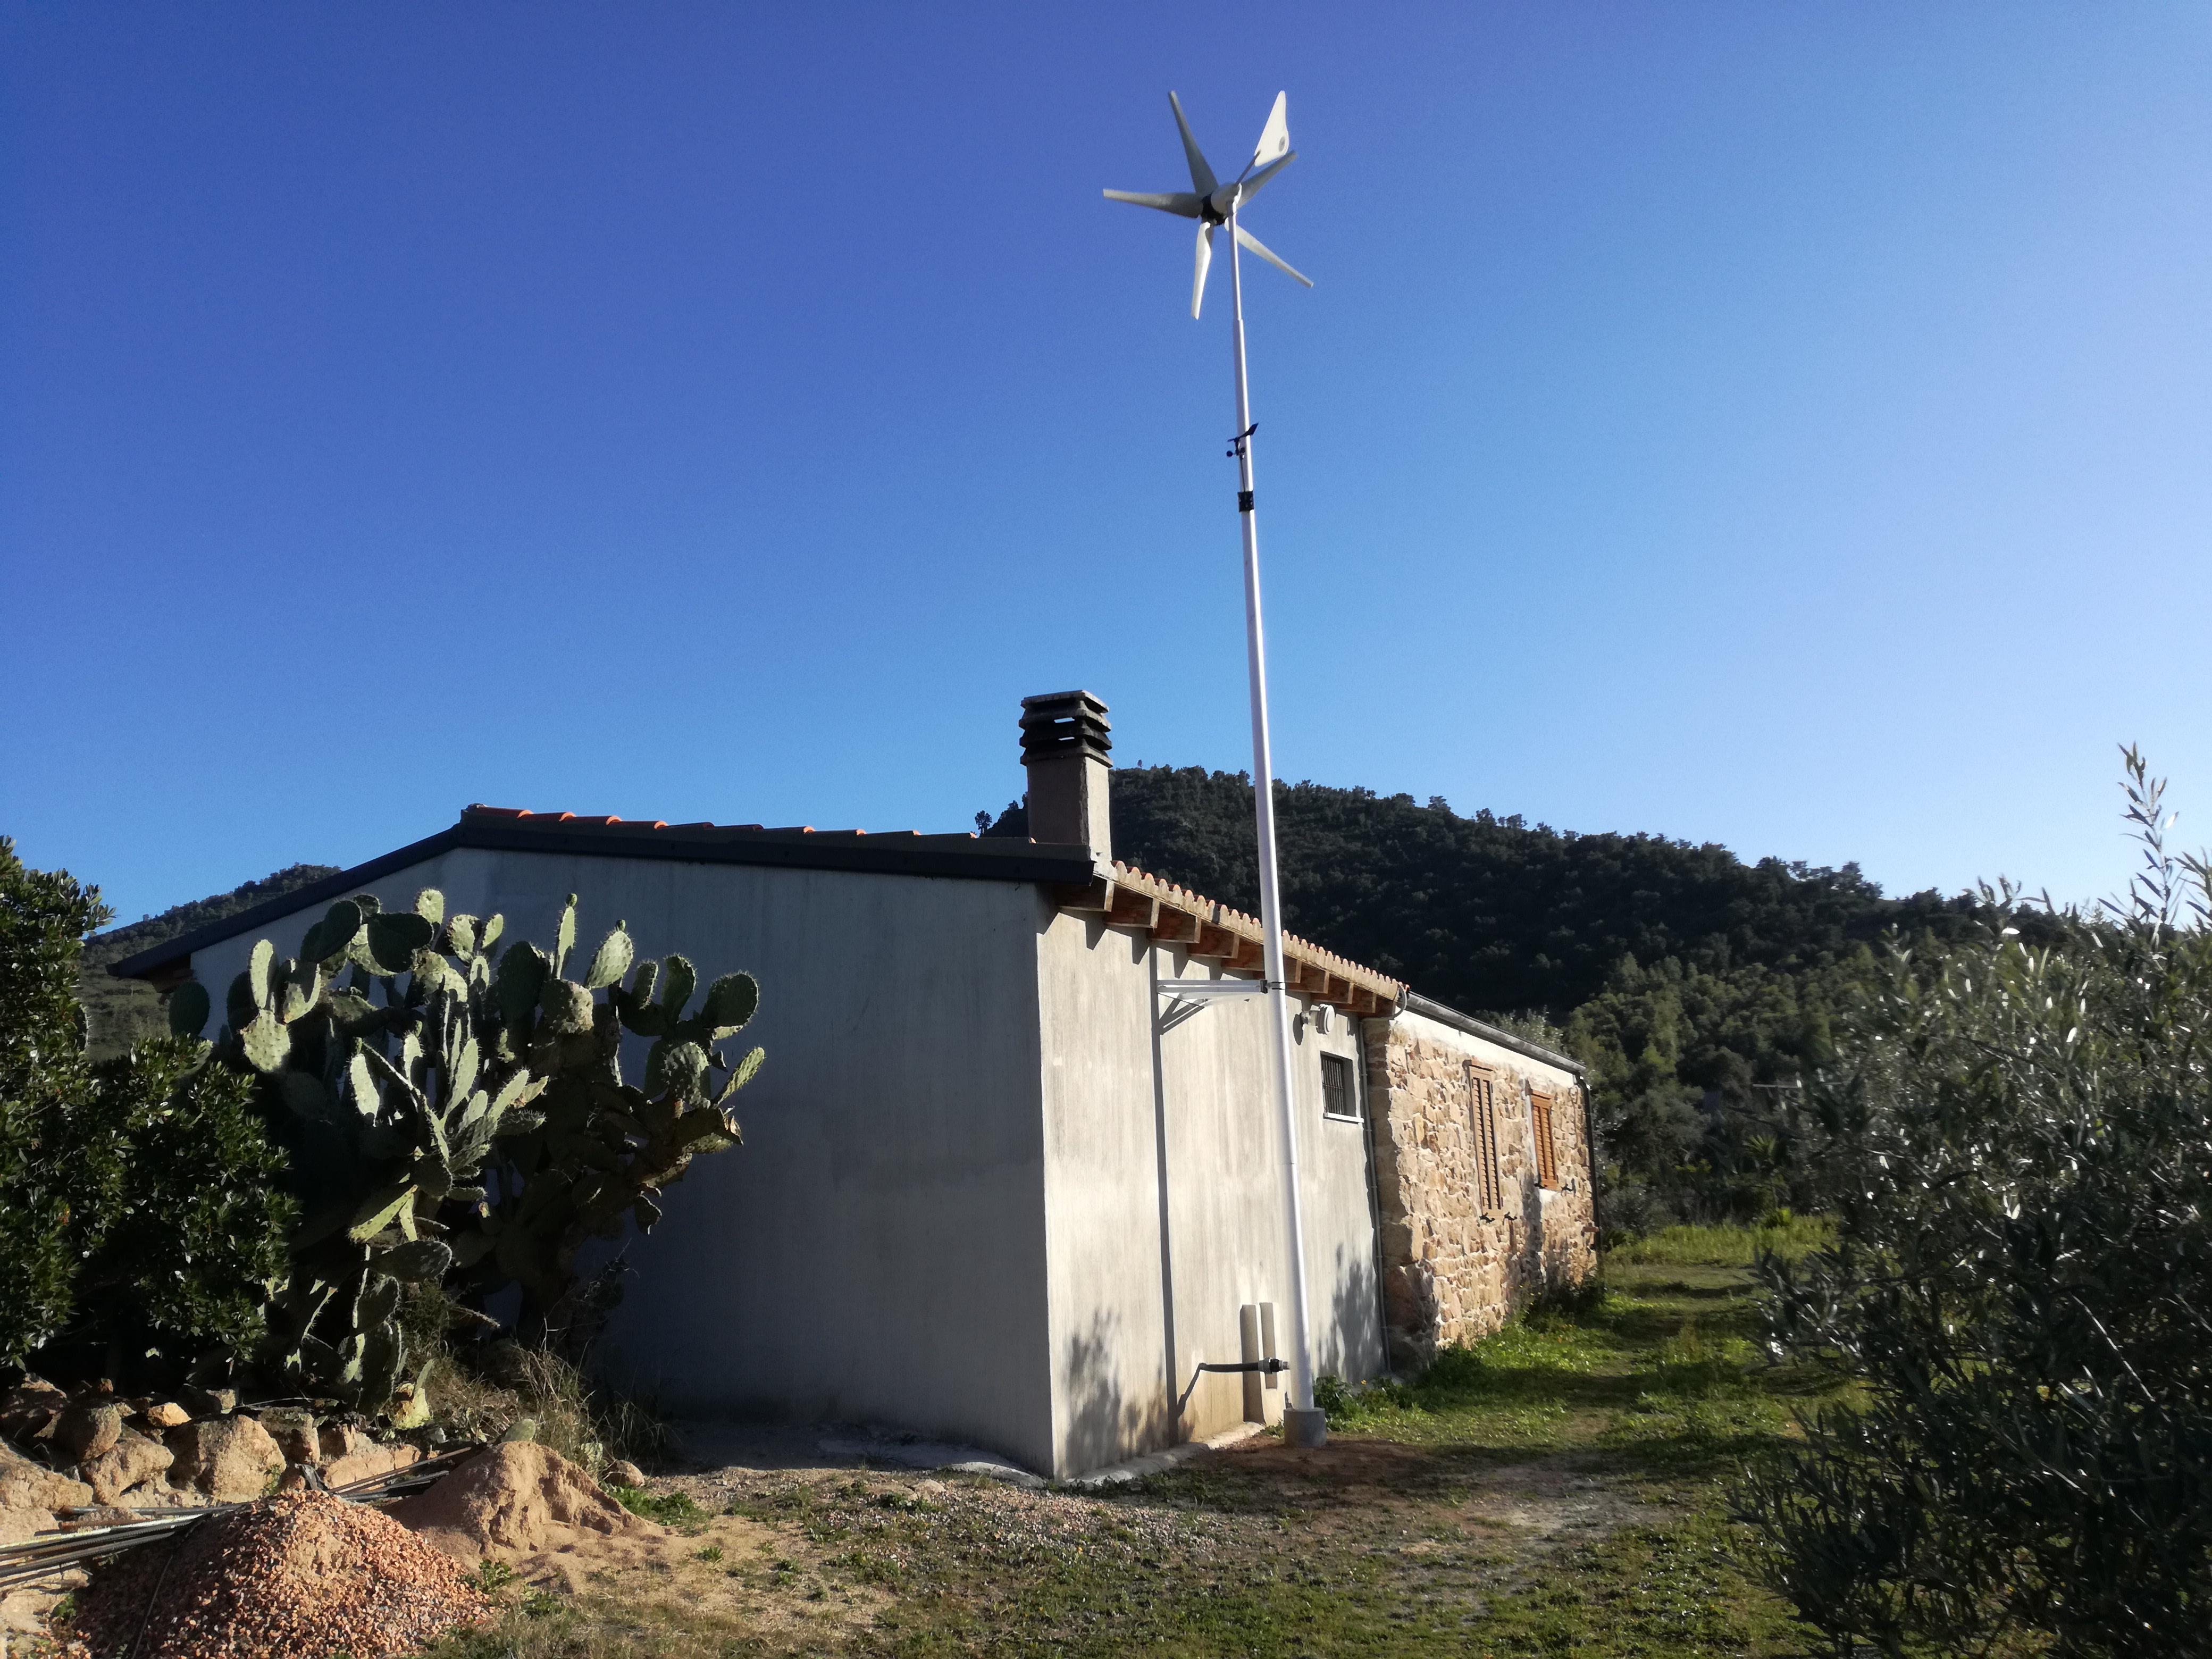 http://www.energialternativa.info/public/newforum/ForumEA/U/IMG_20190303_162551_8.jpg